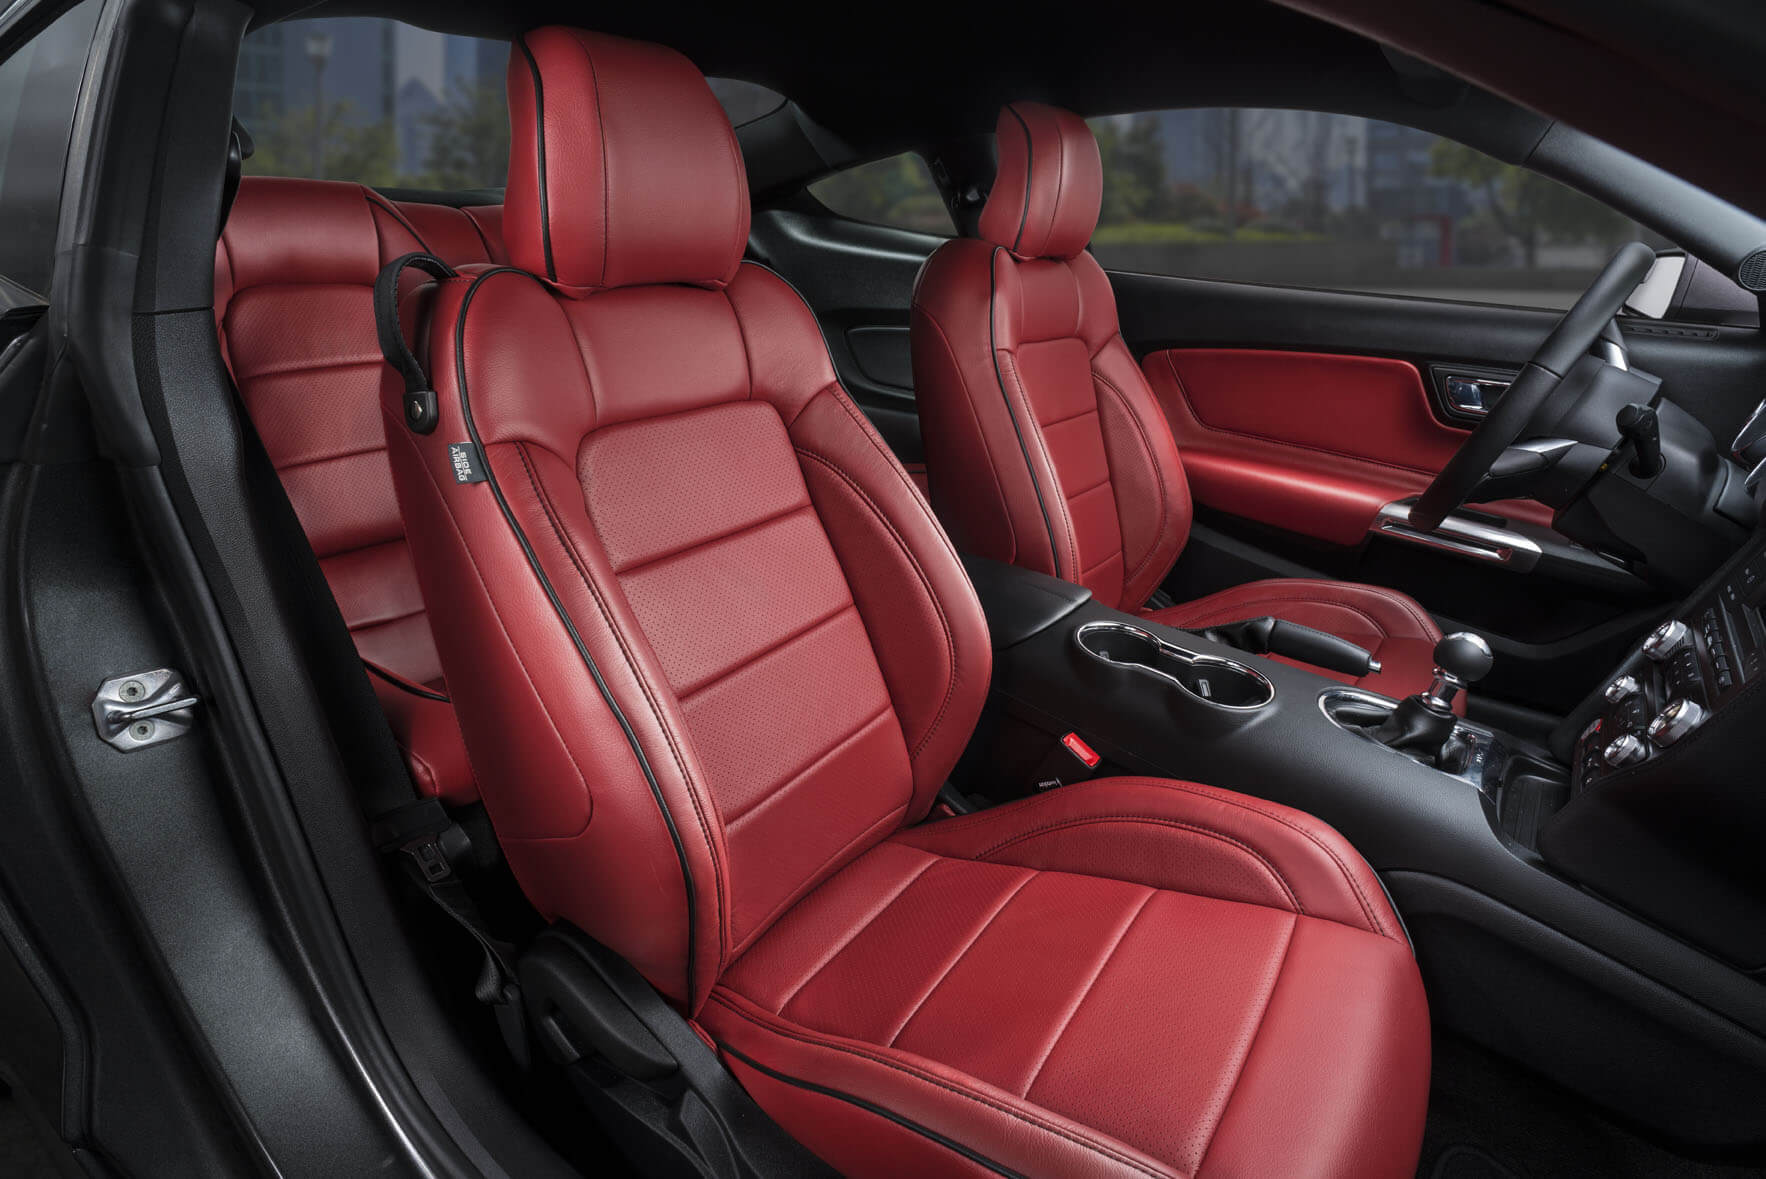 Interior Design Of A 2005 Lexus Rx Rx330